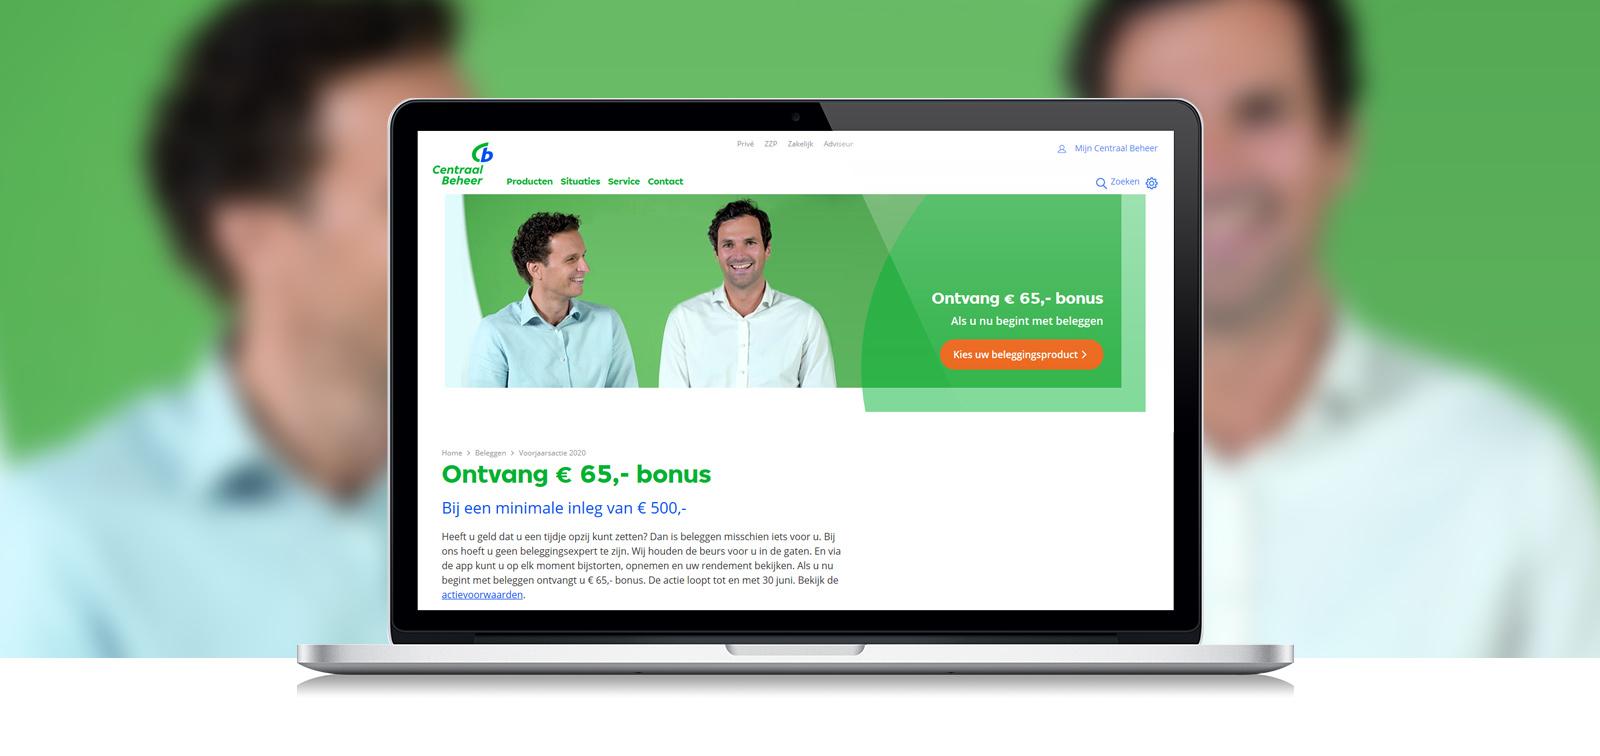 Voorjaarsactie van Centraal Beheer: beleg €500, ontvang €65 bonus